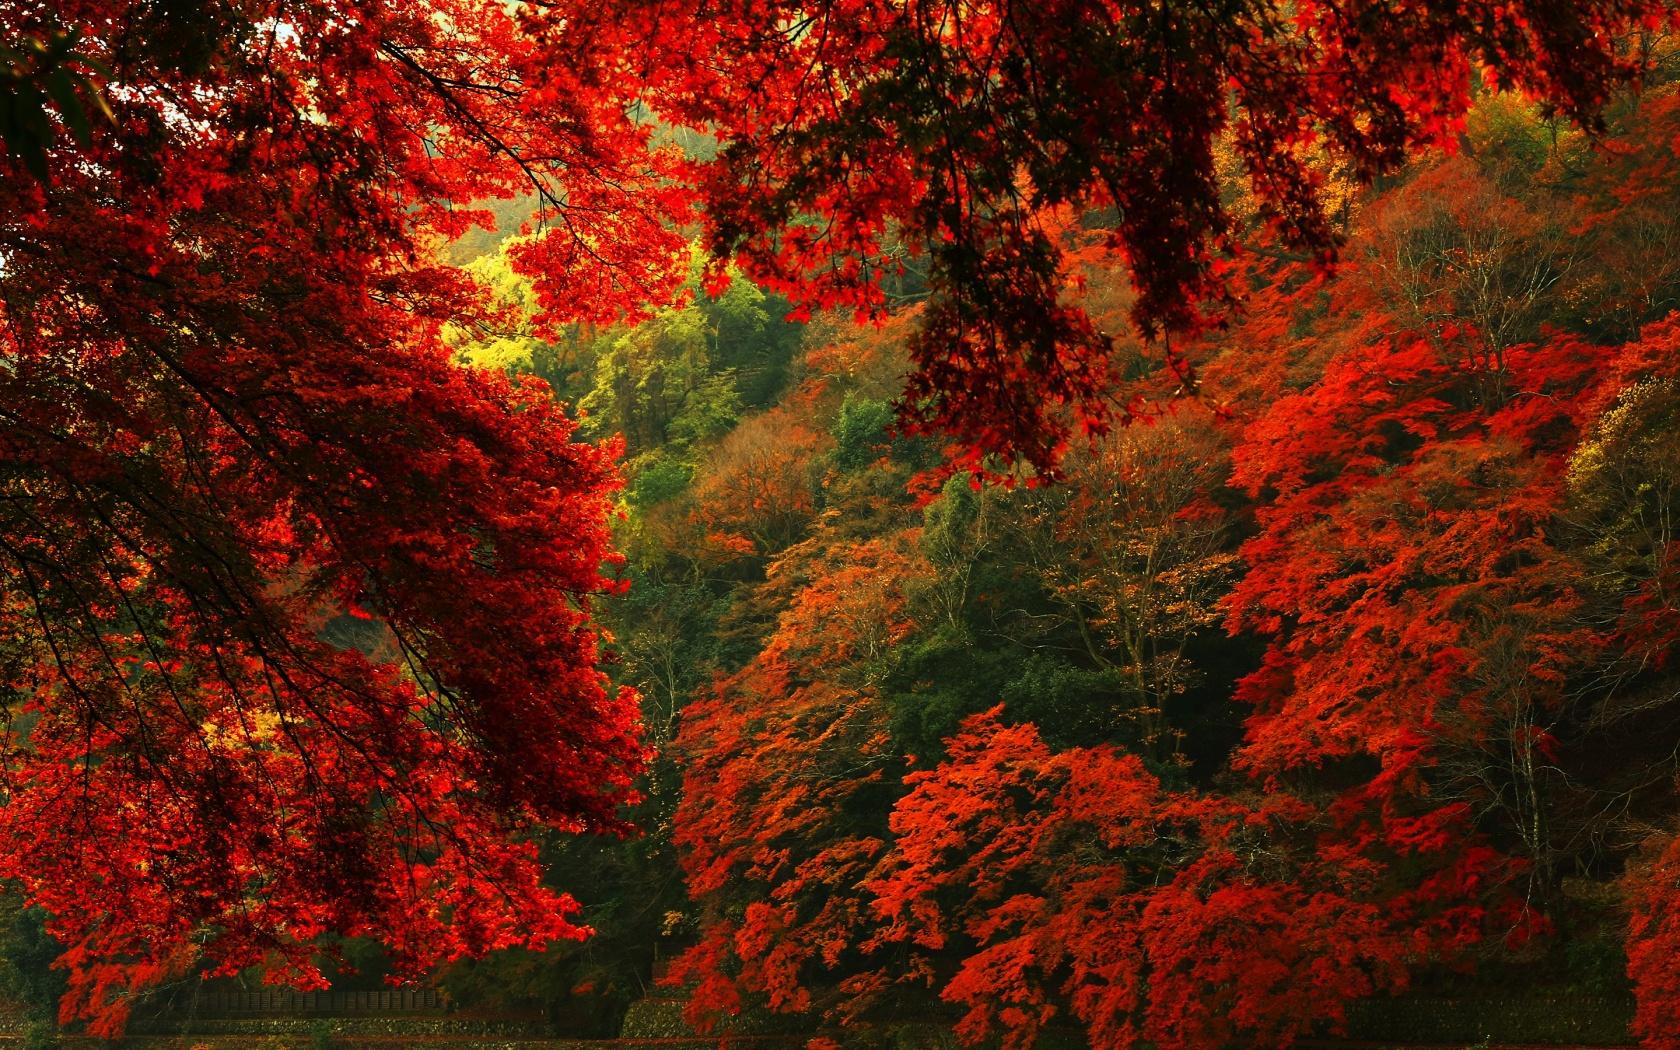 Autumn Leaves 3d Live Wallpaper Hd Wallpapers Forest Red2 Hd Desktop Wallpapers 4k Hd